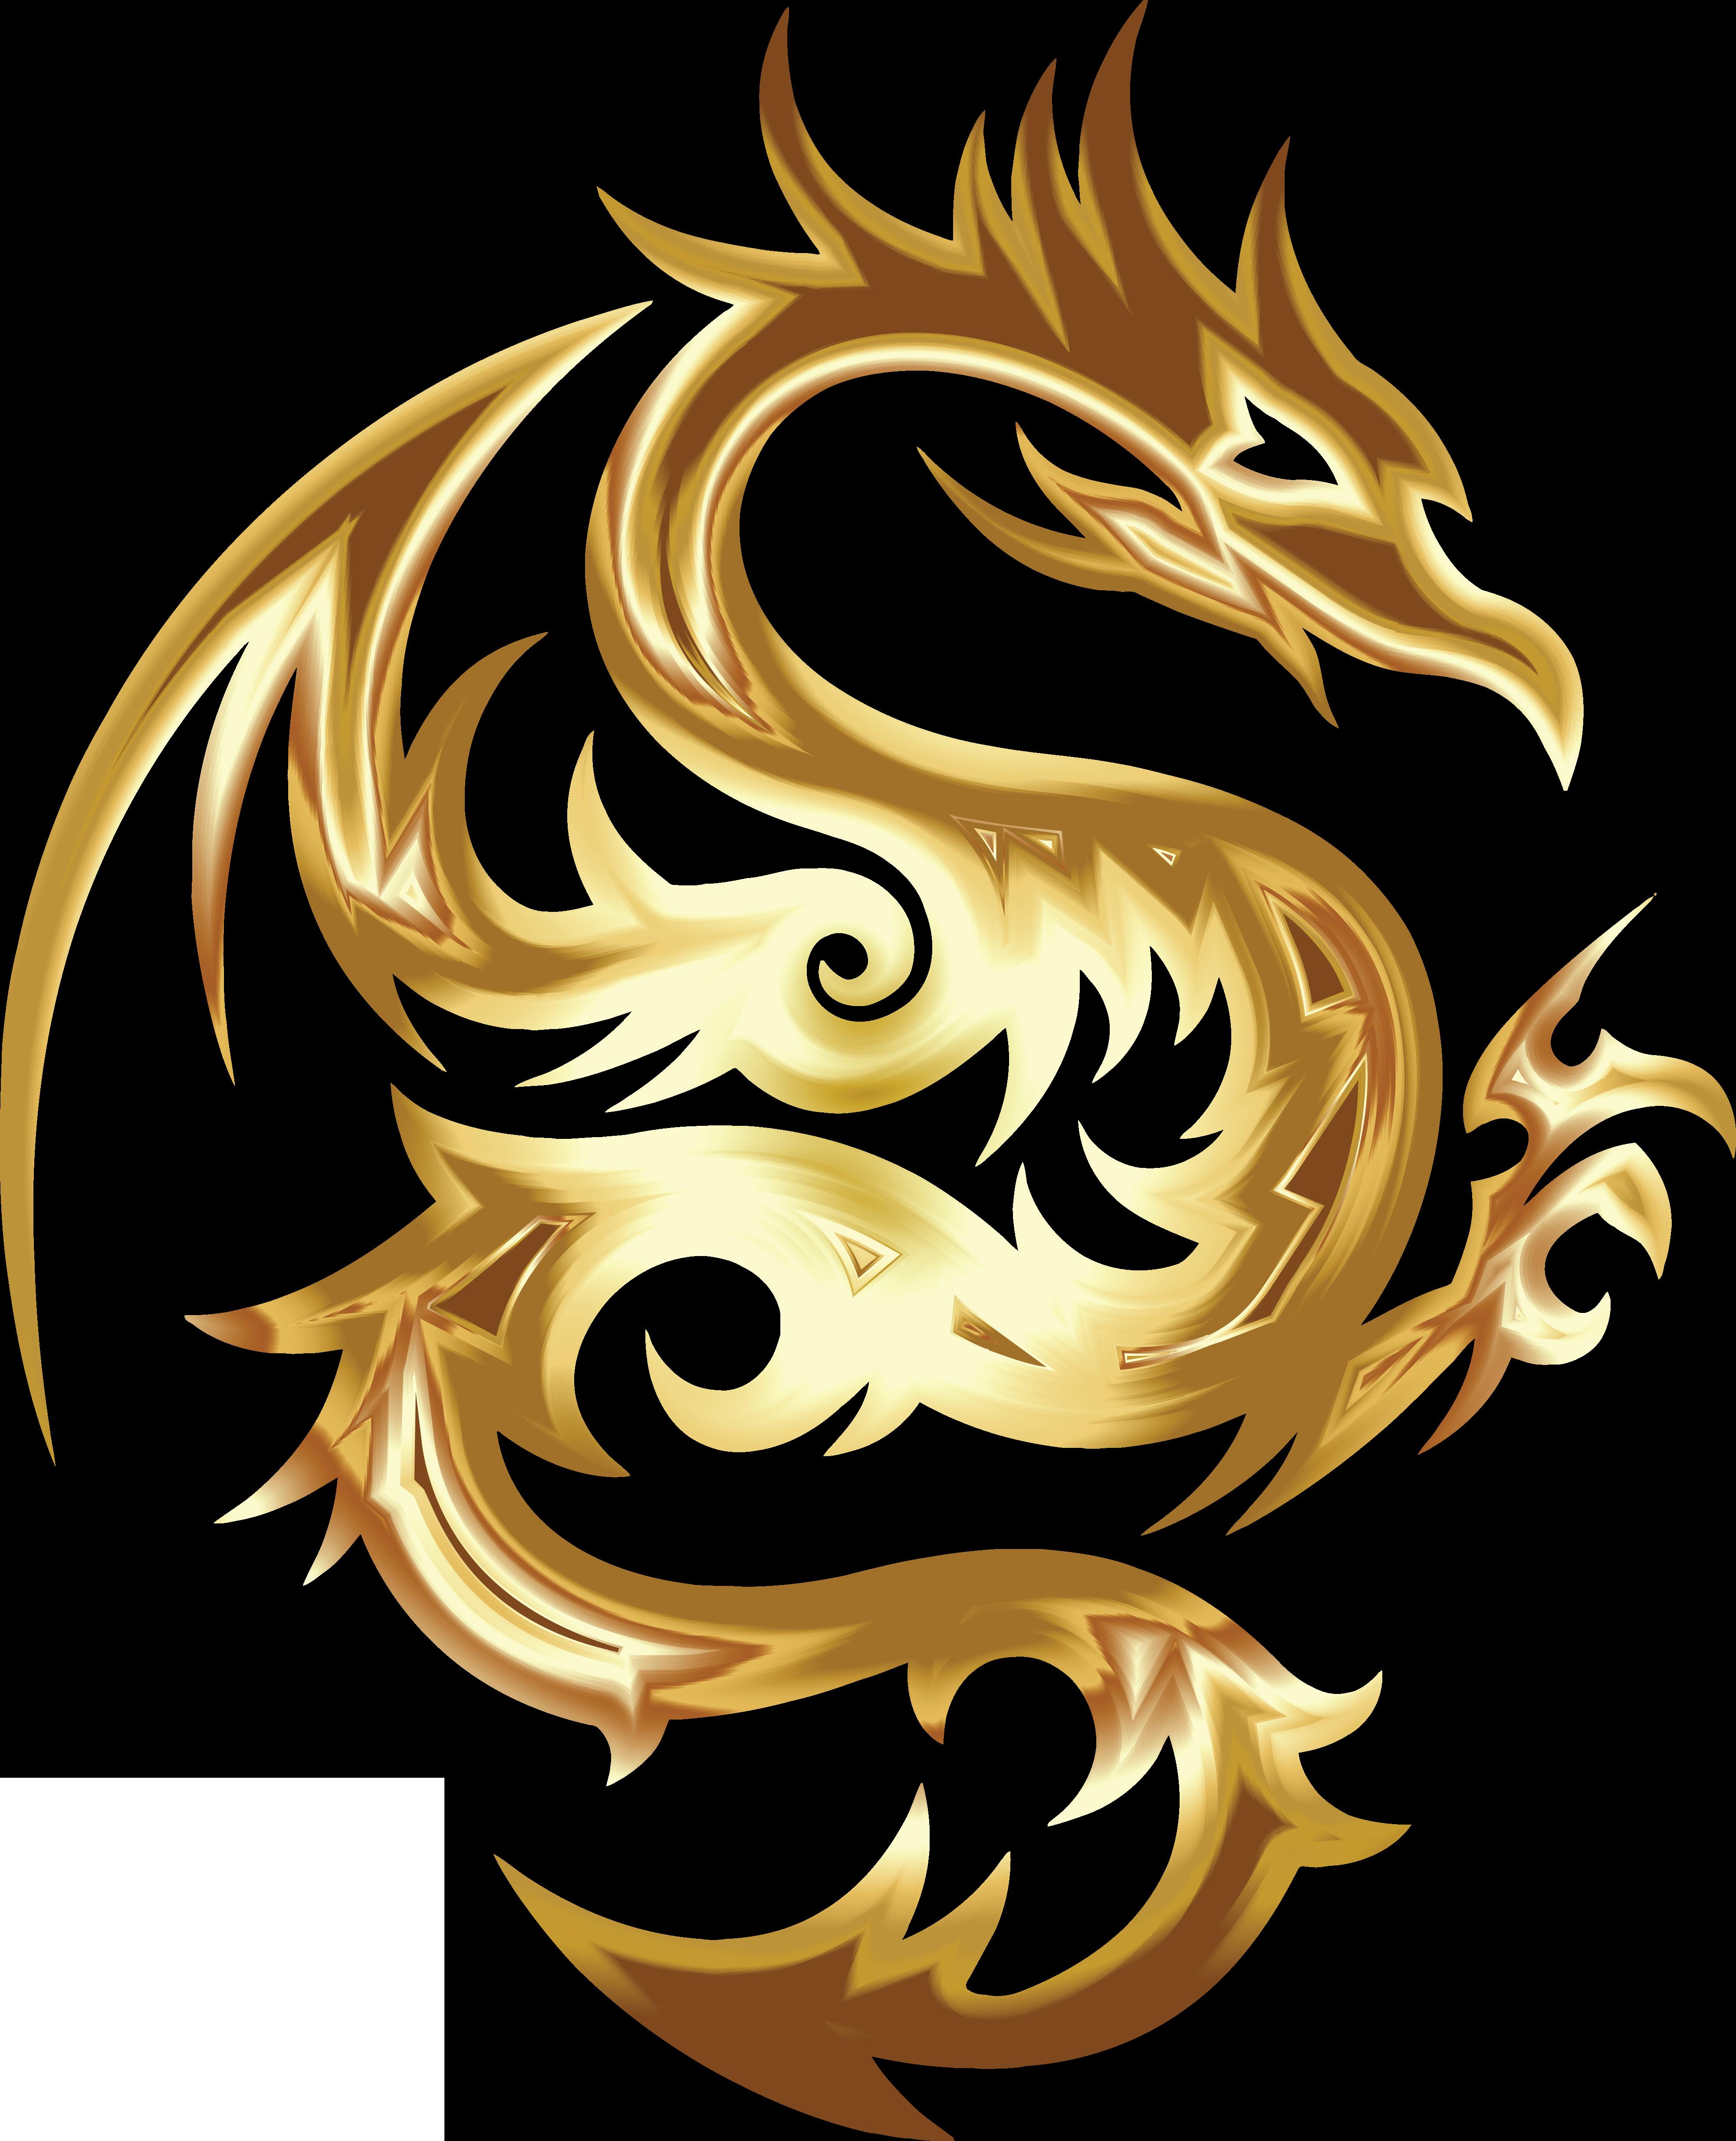 Tribal dragon logo png